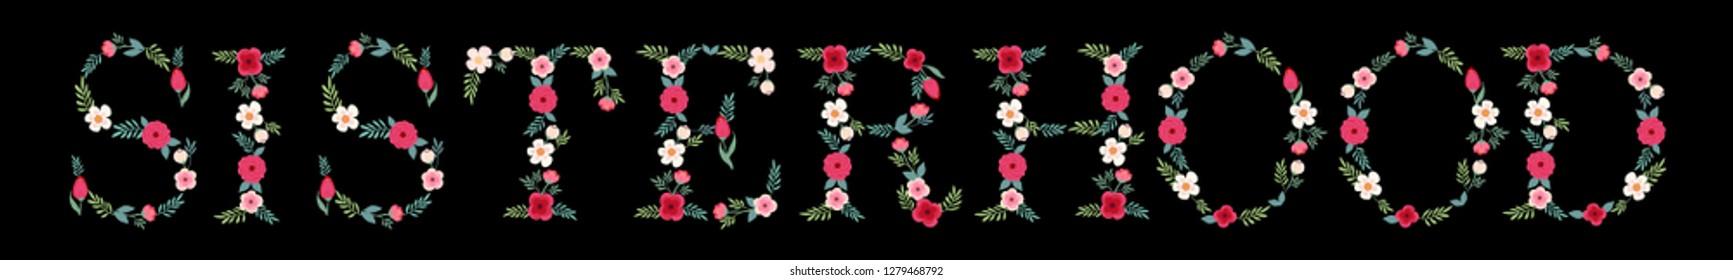 Beautiful Floral Lettering Inscription Sisterhood